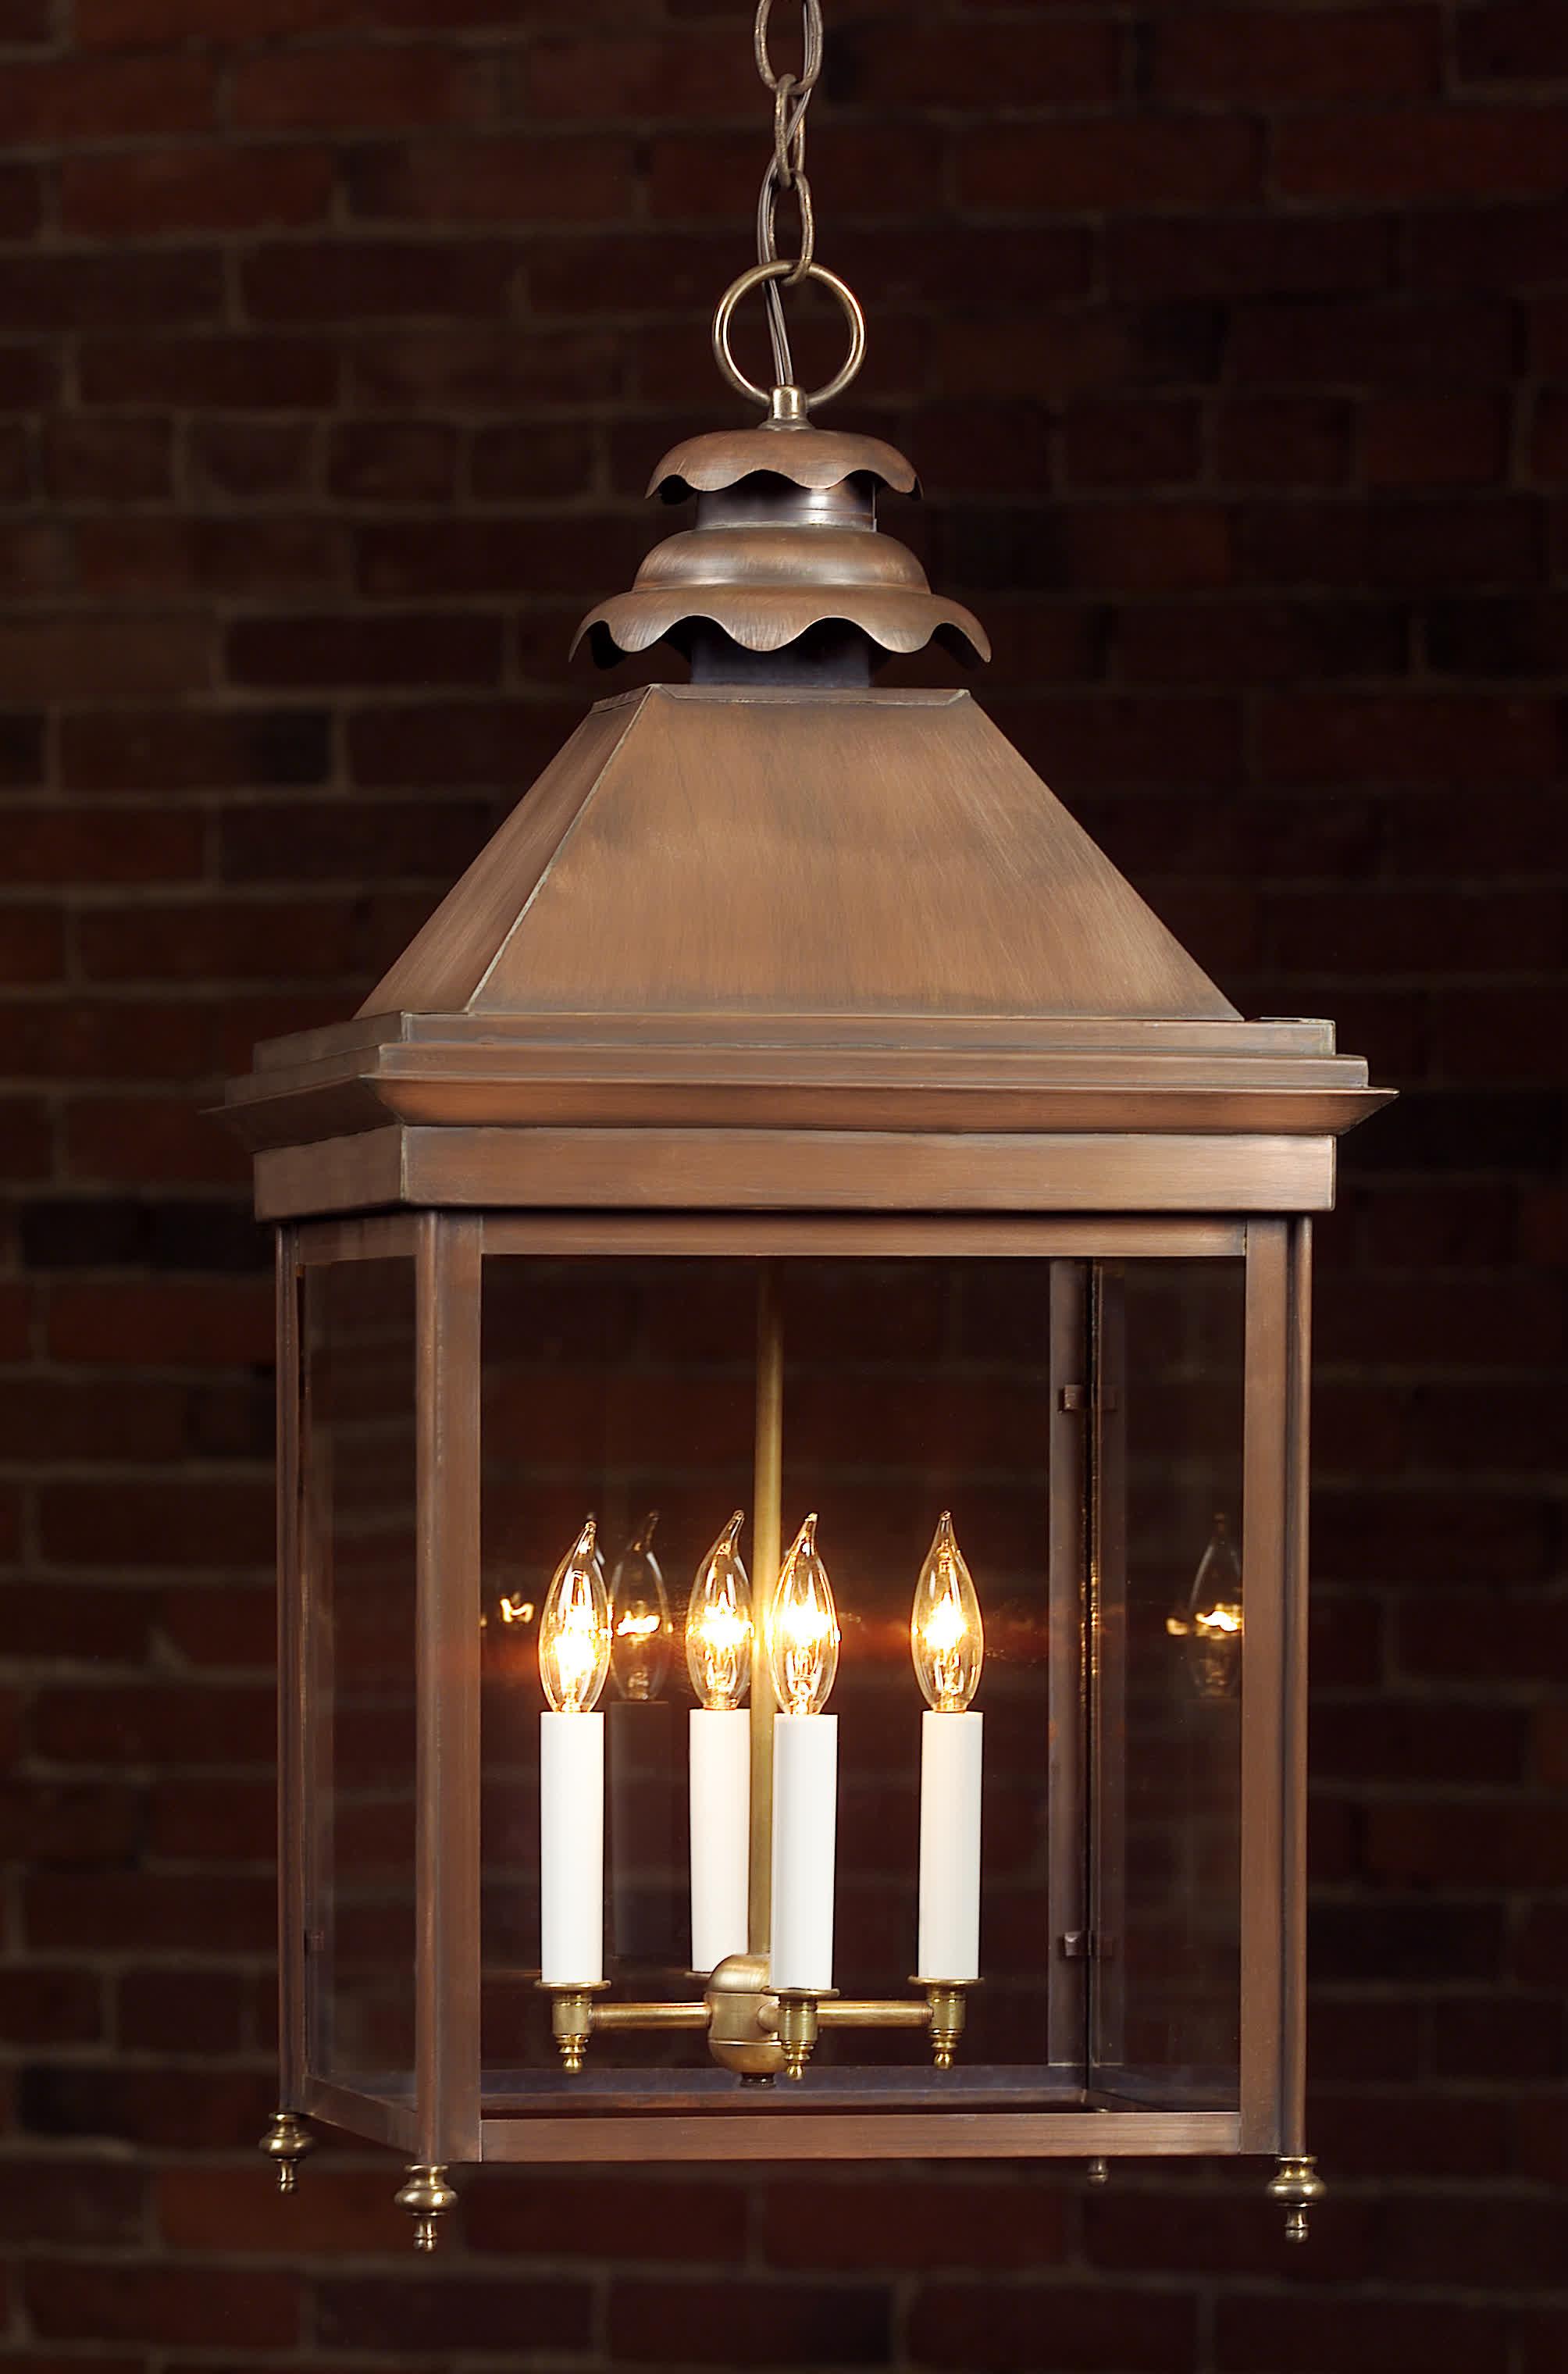 English Manor Copper Hanging Lights Light Handmade